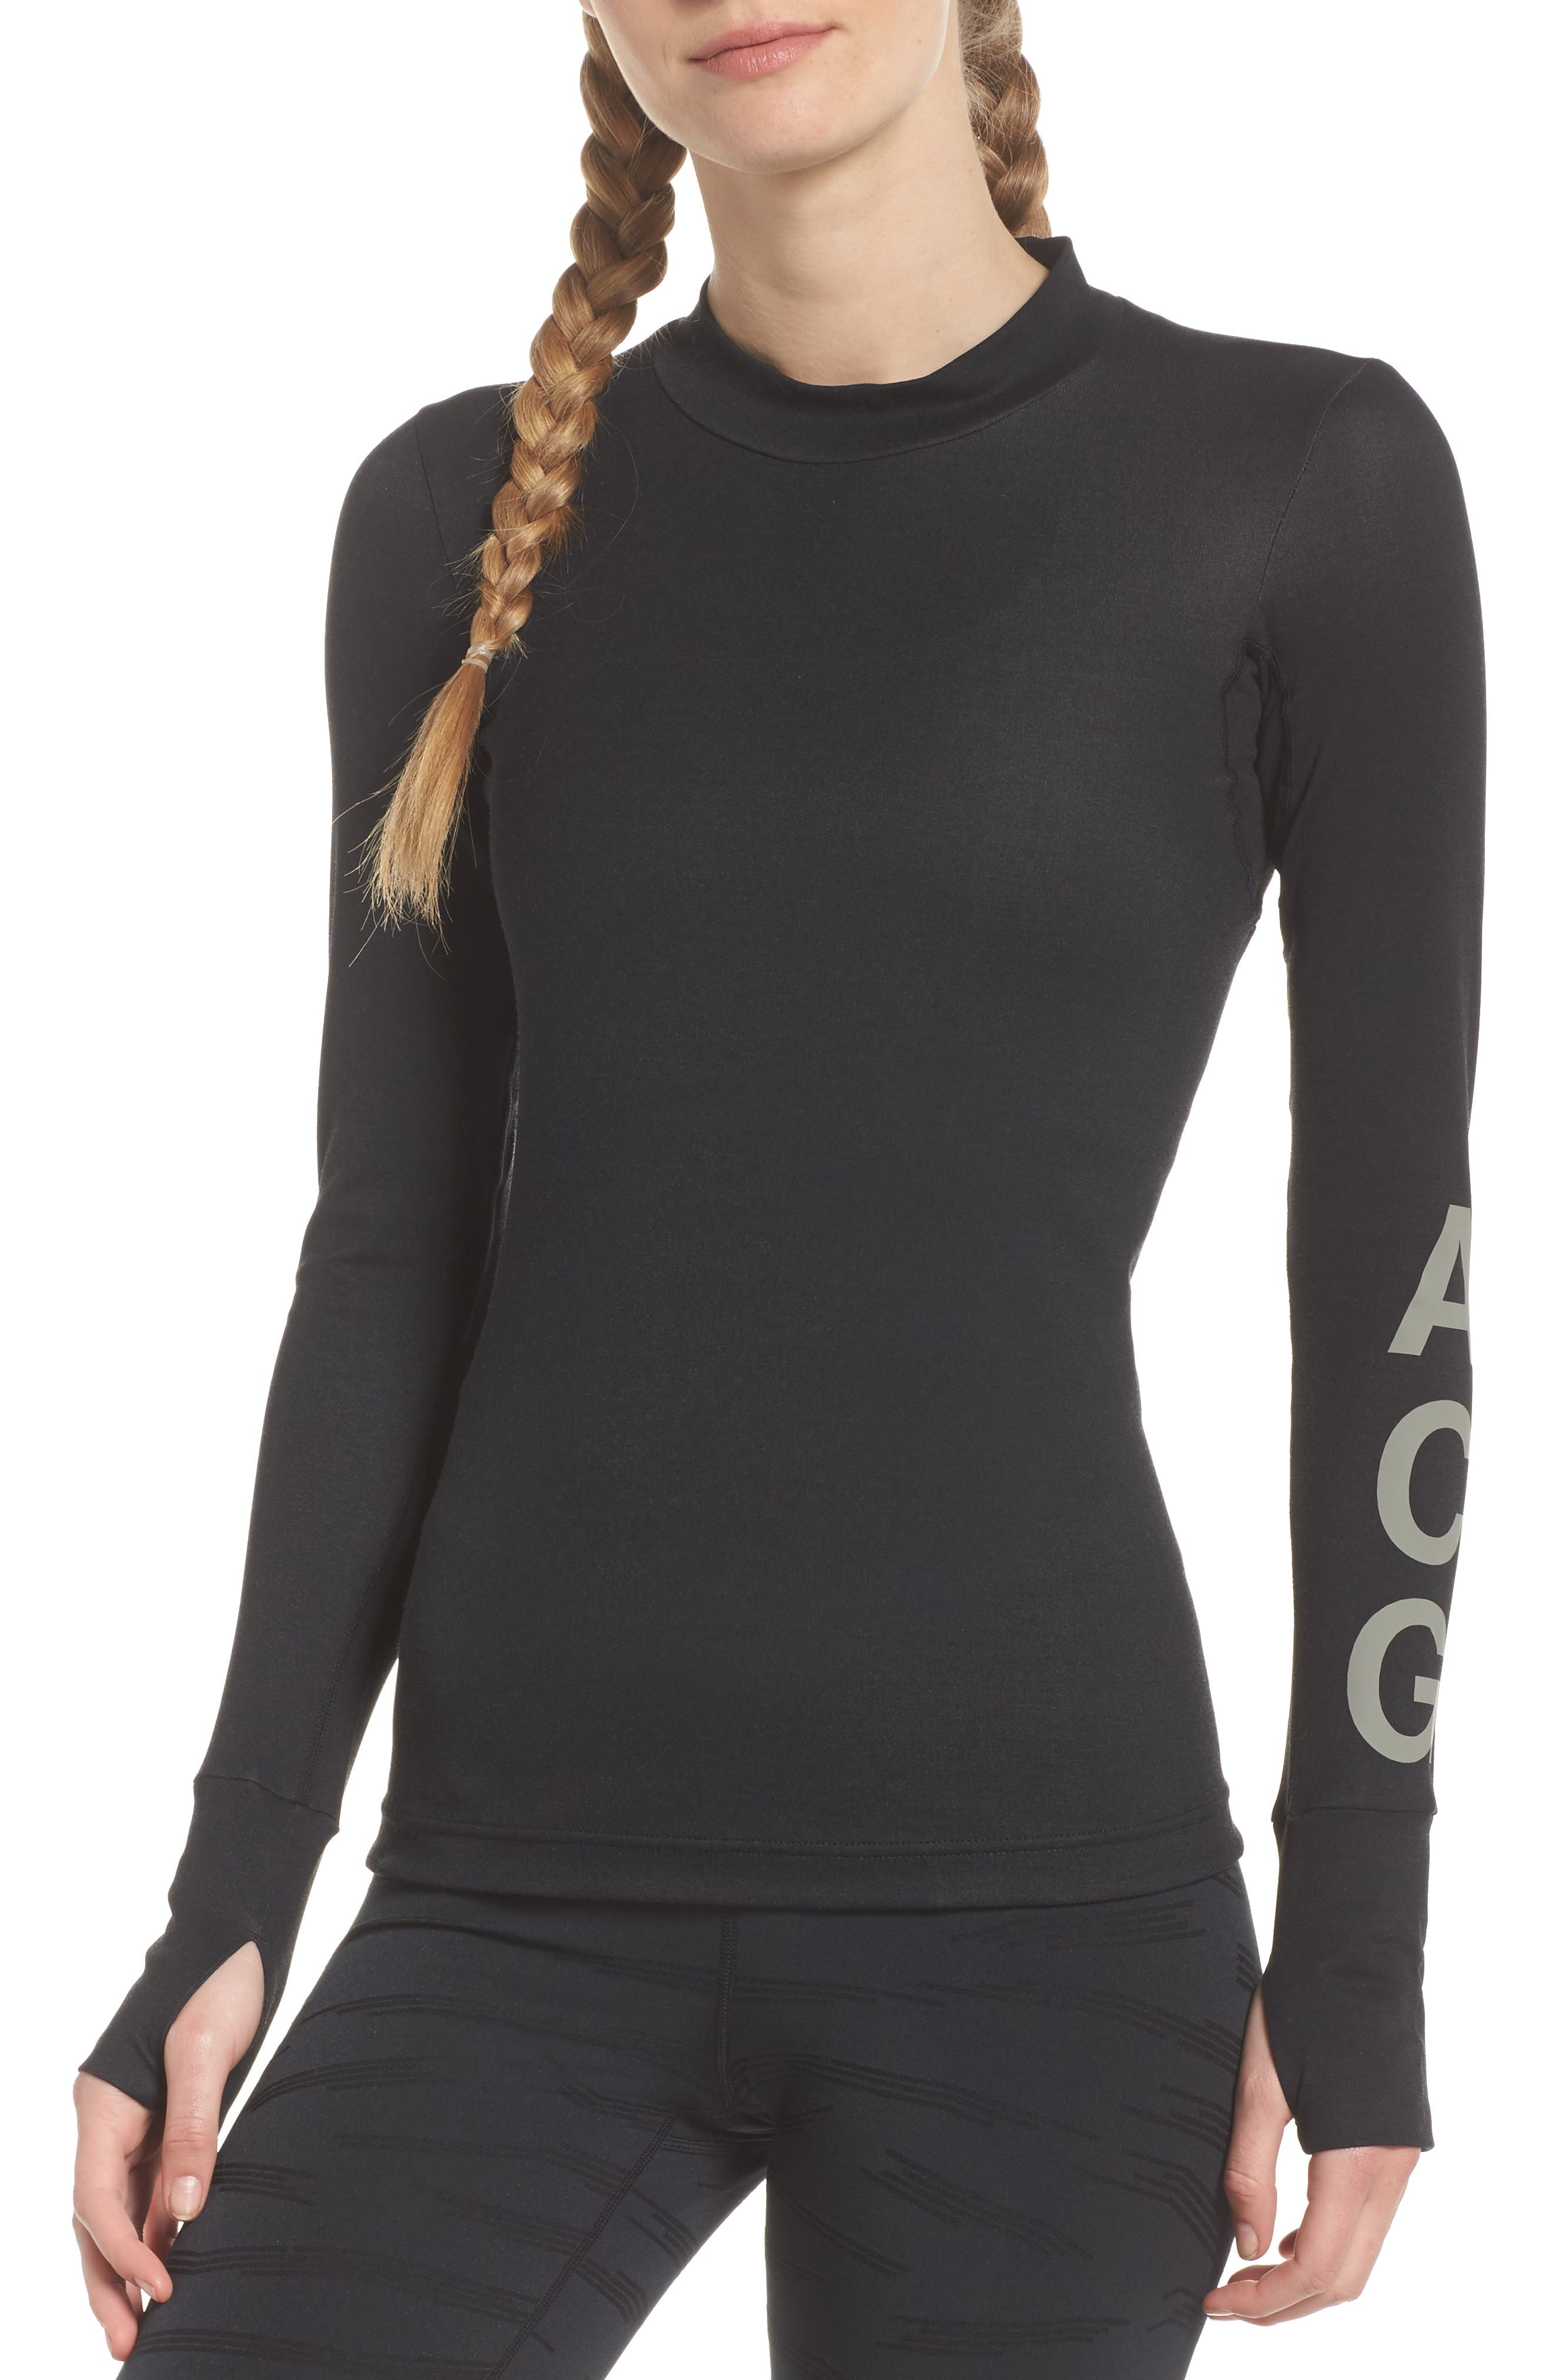 NikeLab ACG Long Sleeve Women's Top,                             Main thumbnail 1, color,                             010